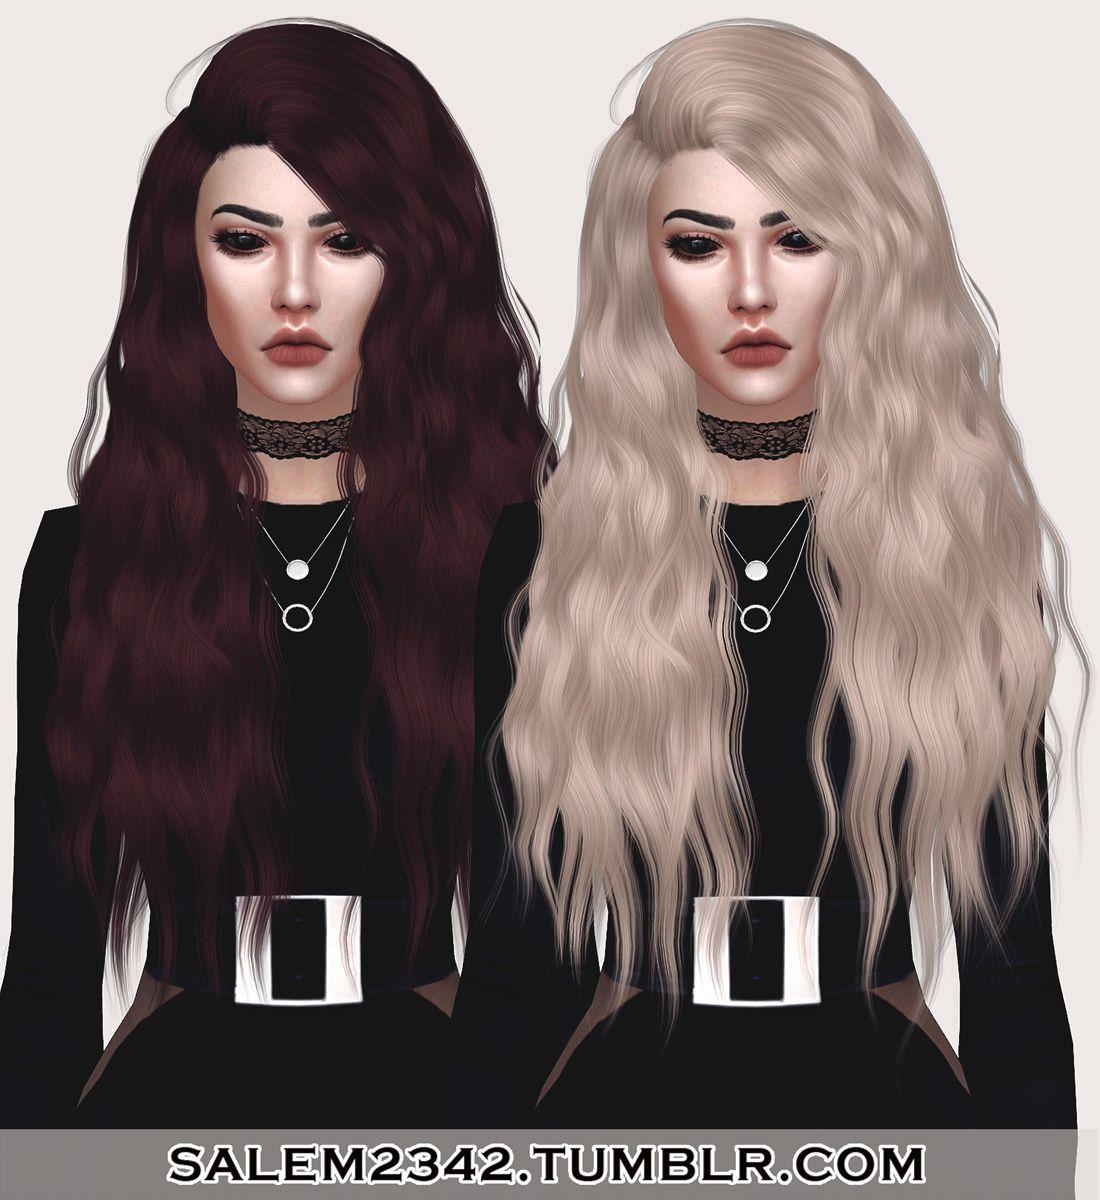 Salem2342 Stealthics Sleepwalking Hair Retextured Ts4